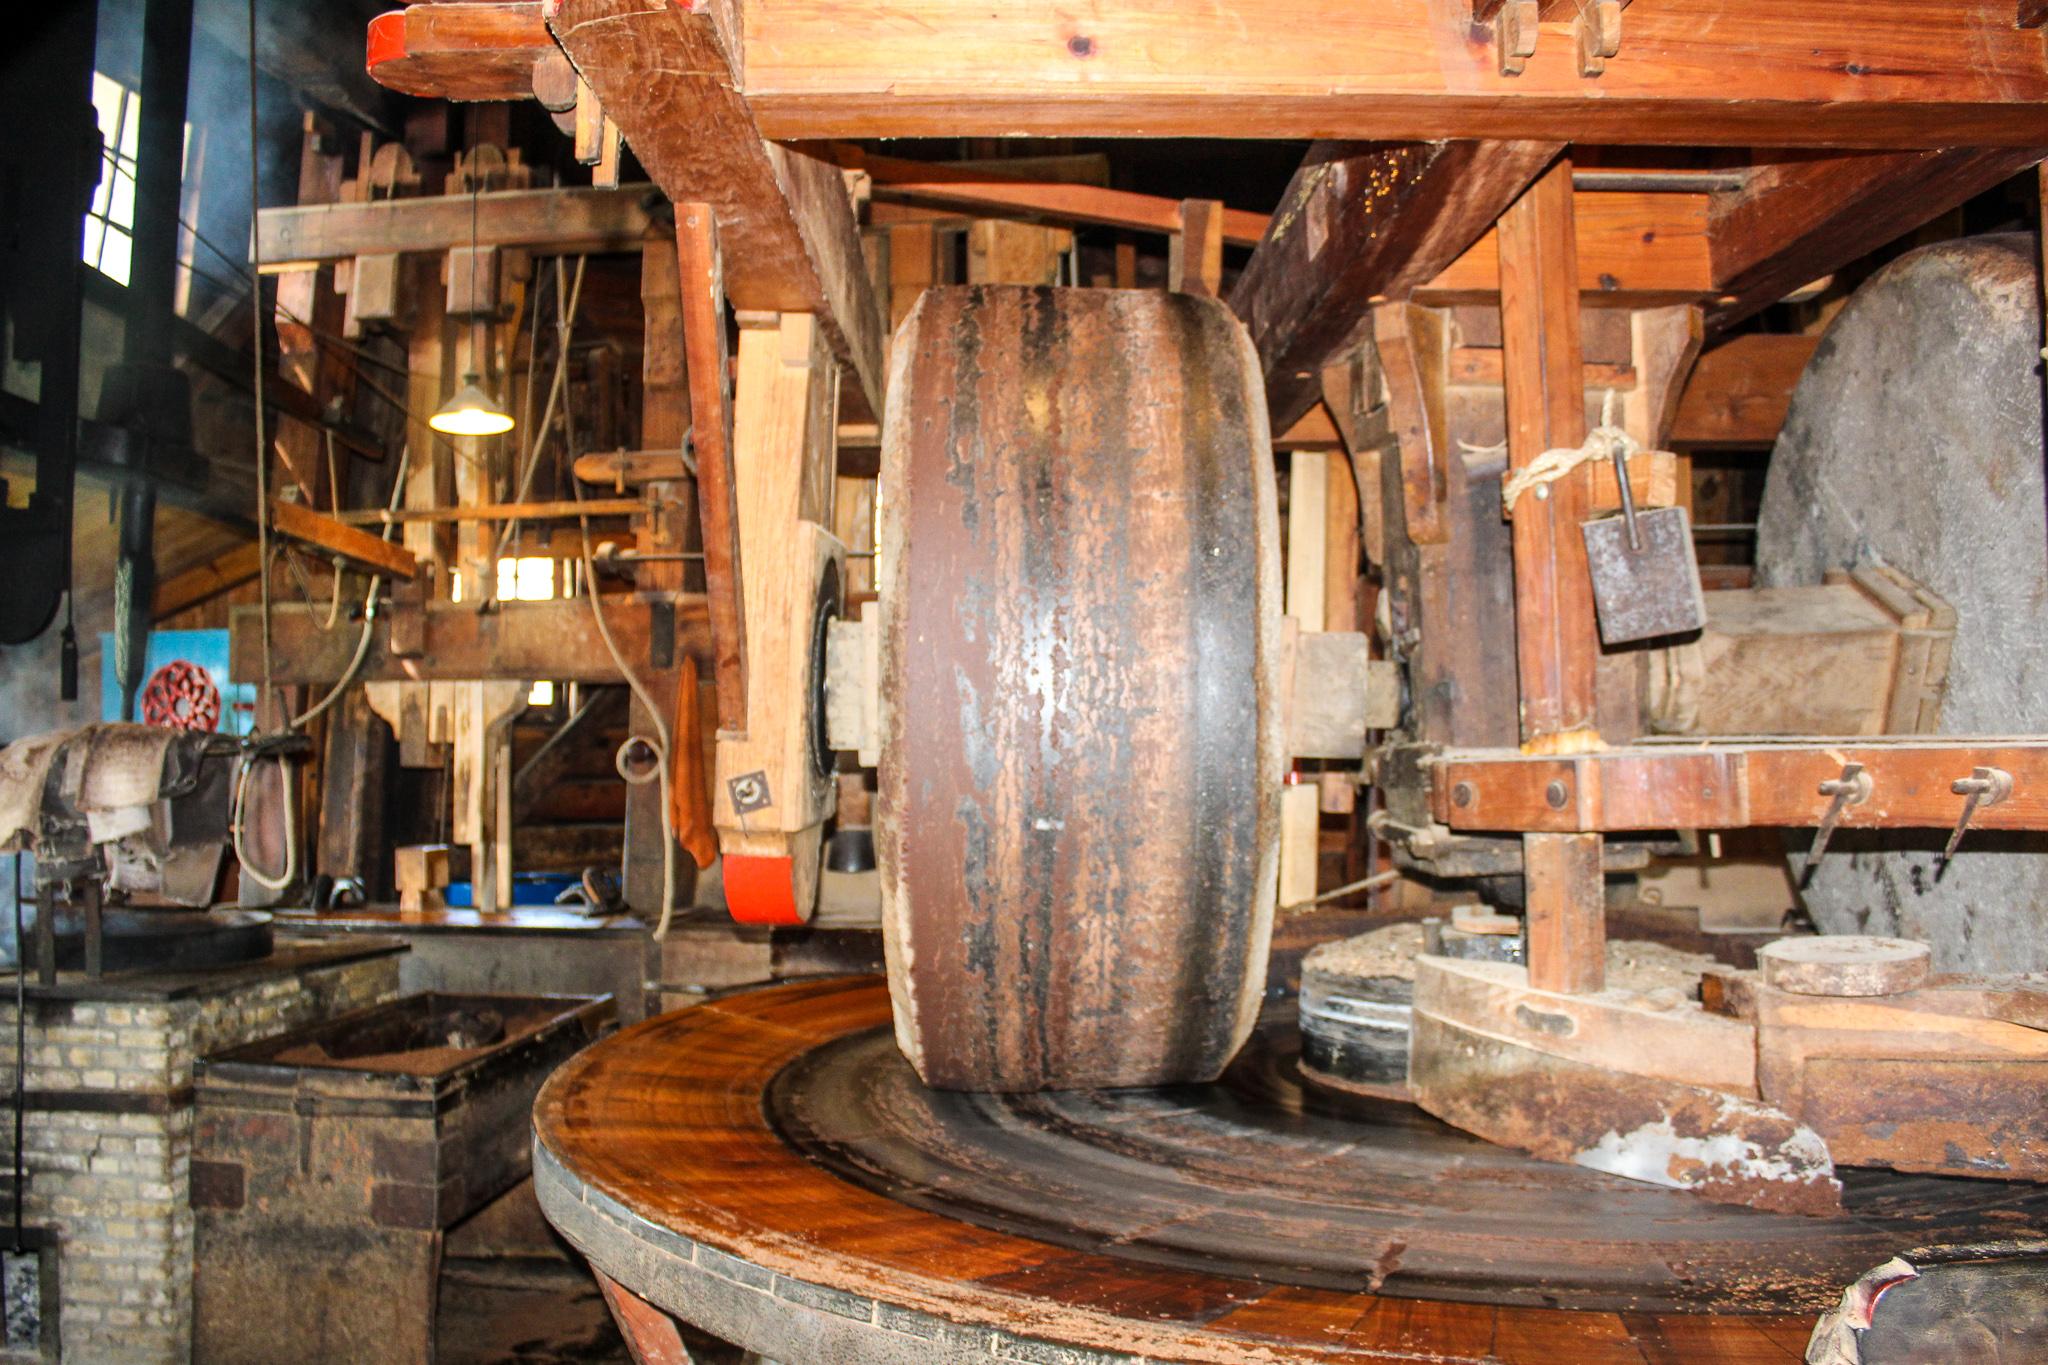 how to visit zaanse schans: go inside the windmills